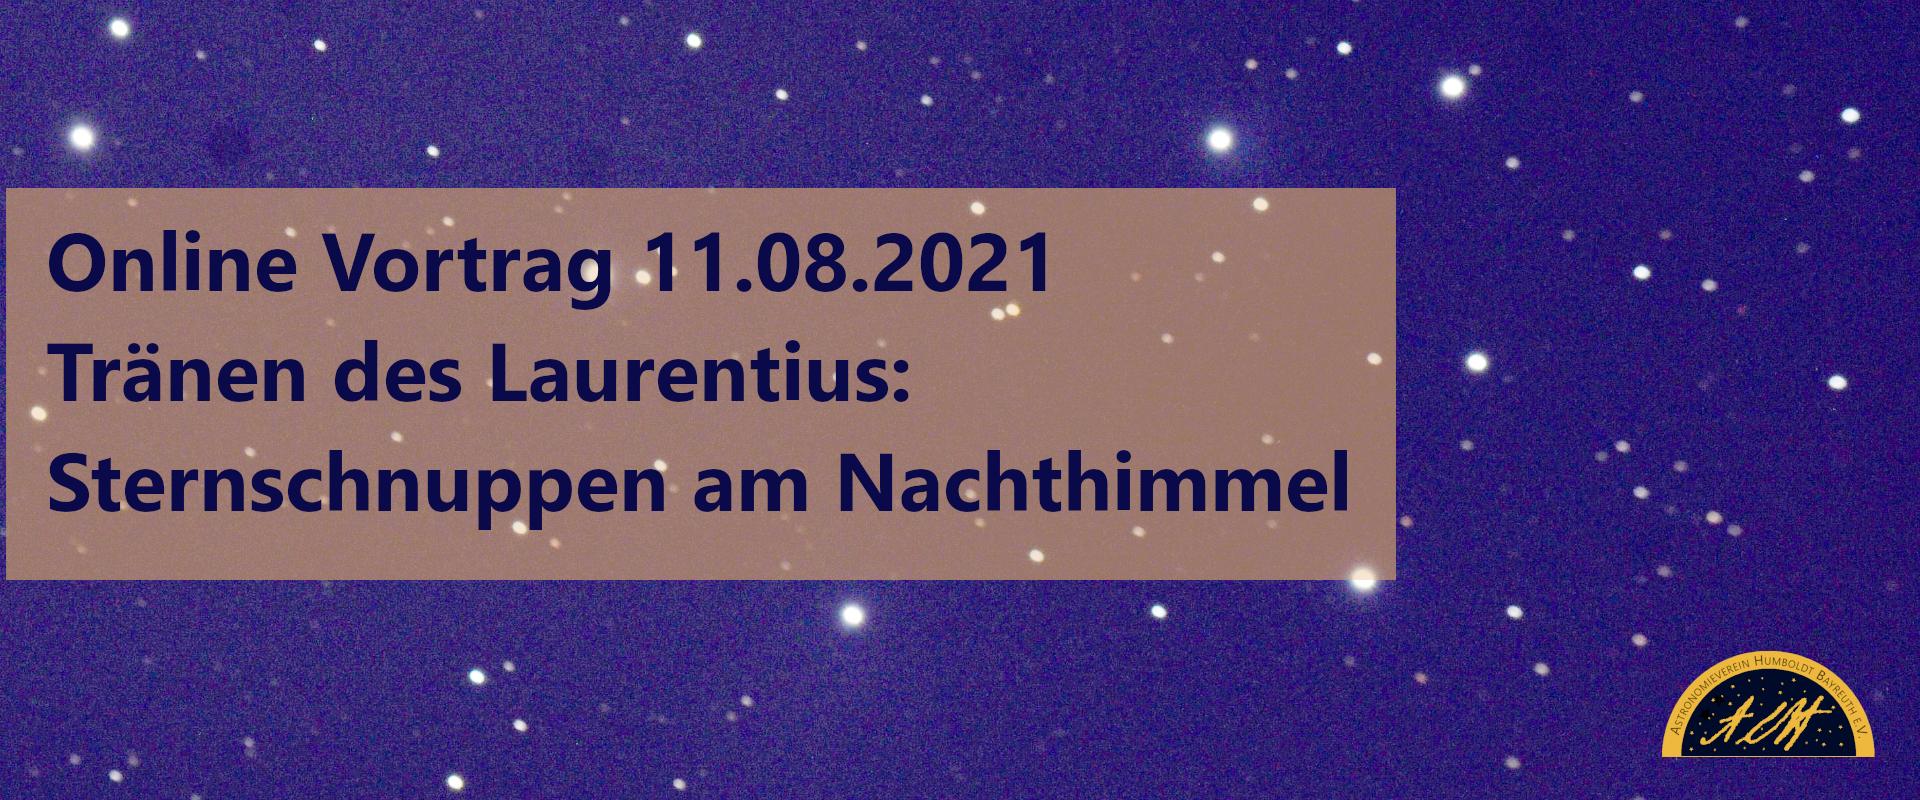 vortrag-astronomie